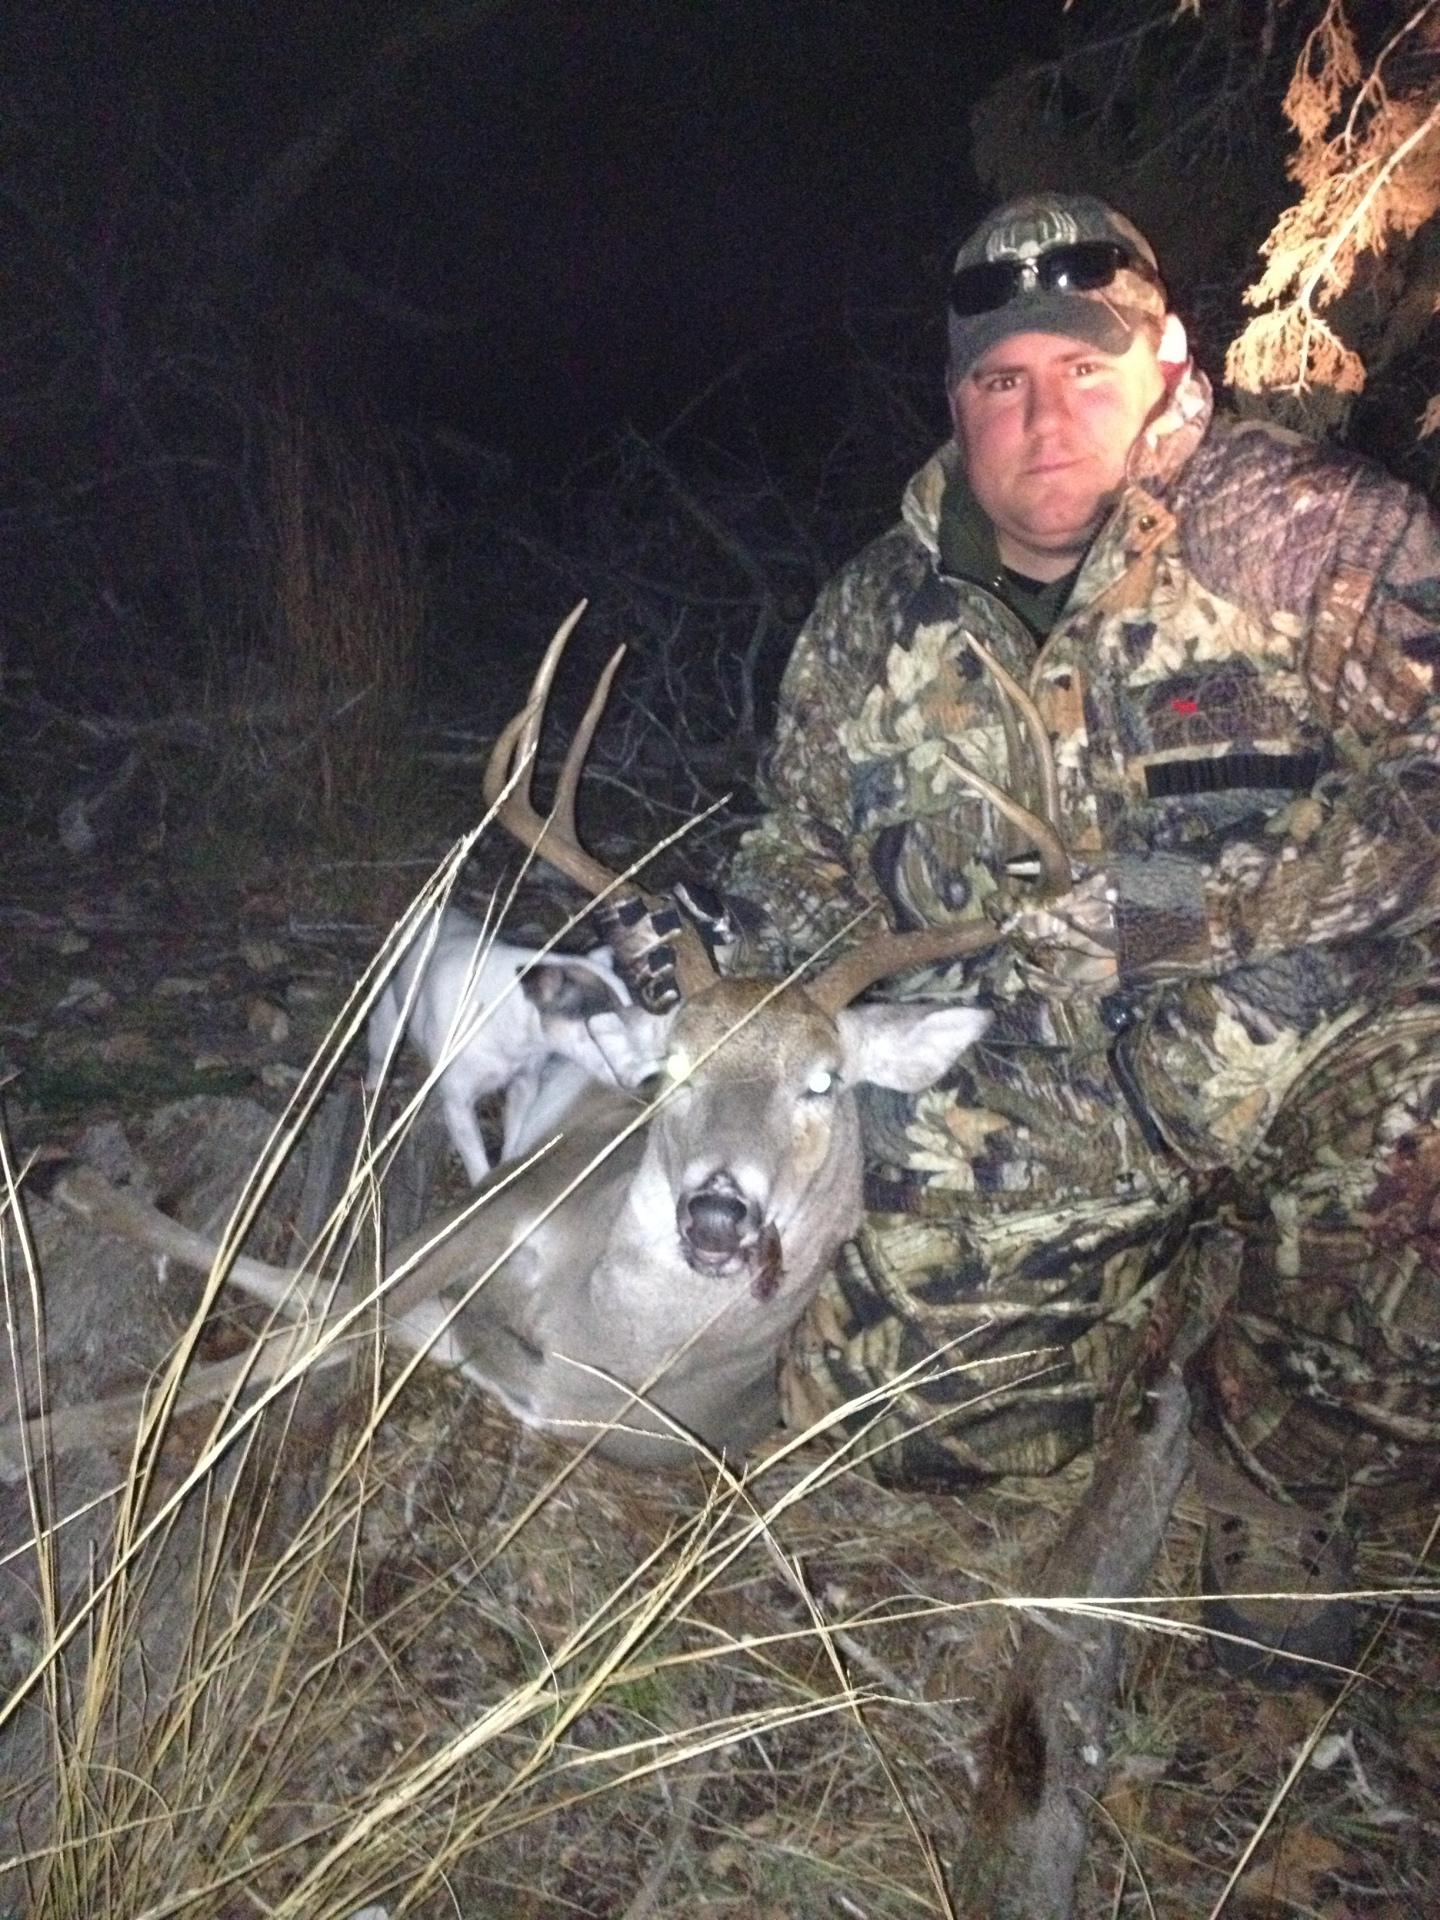 Texans Outdoors, deer hunting, Texans, Outdoors, Texans Outdoors, Texas